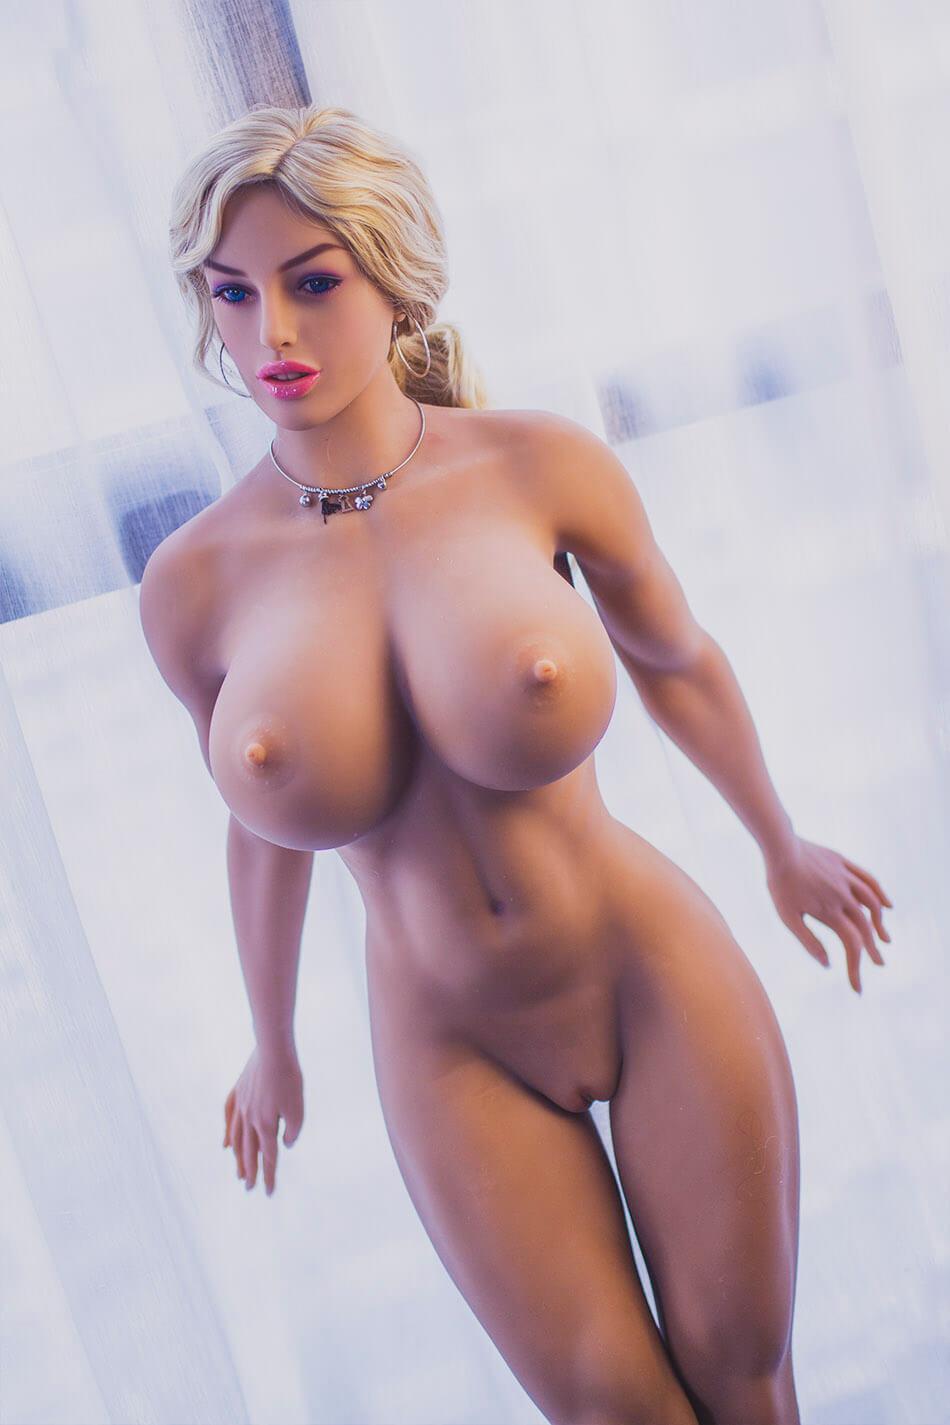 sex doll para hombres